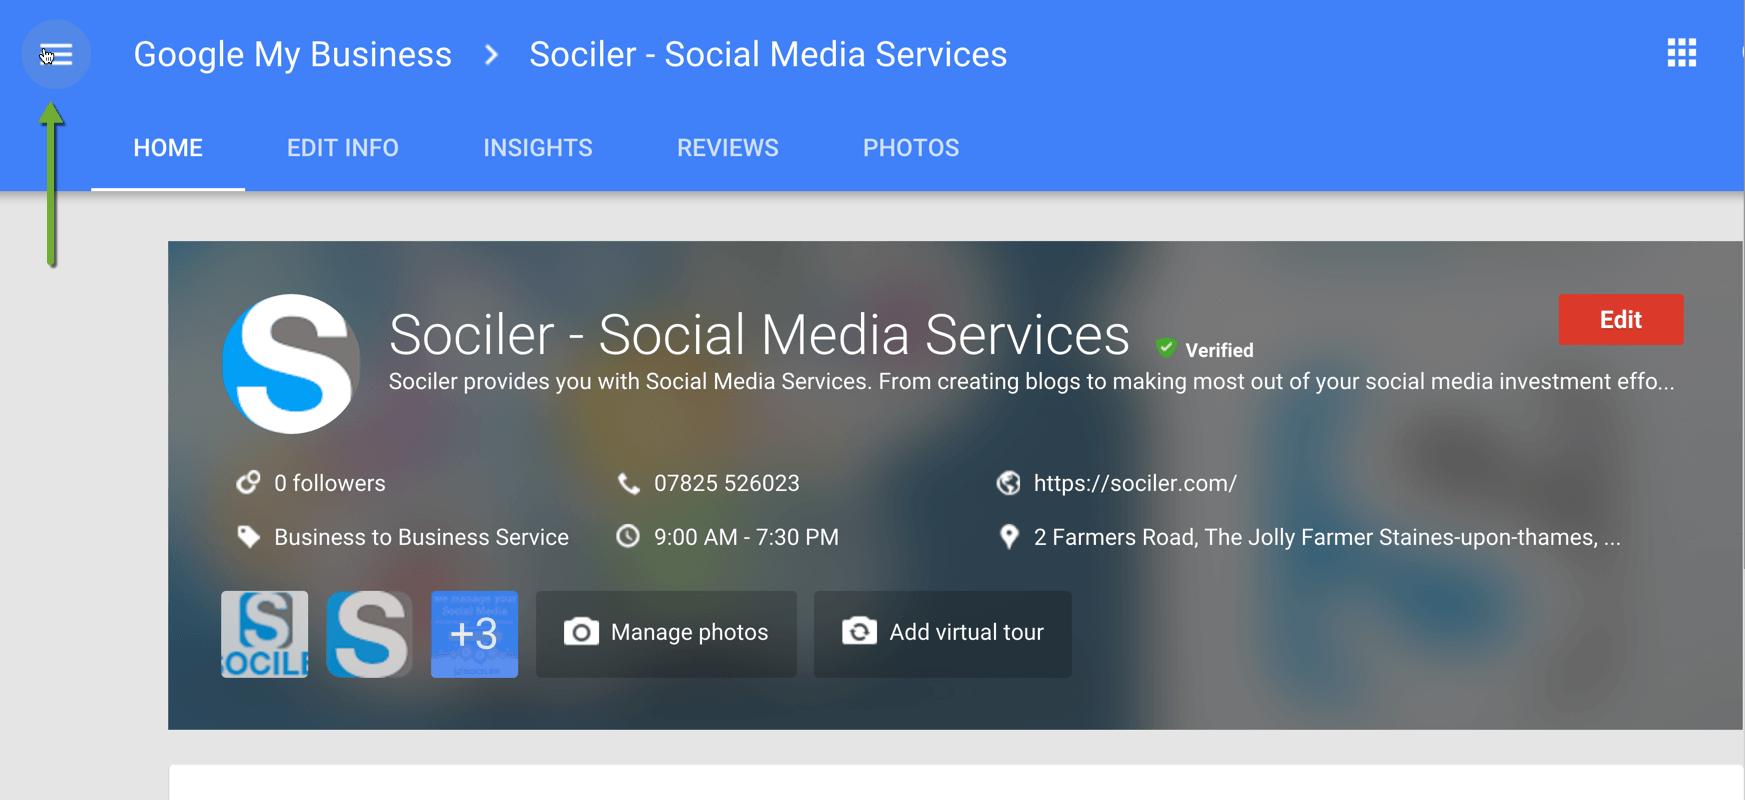 Google Plus Page Menu Icon Managing Business